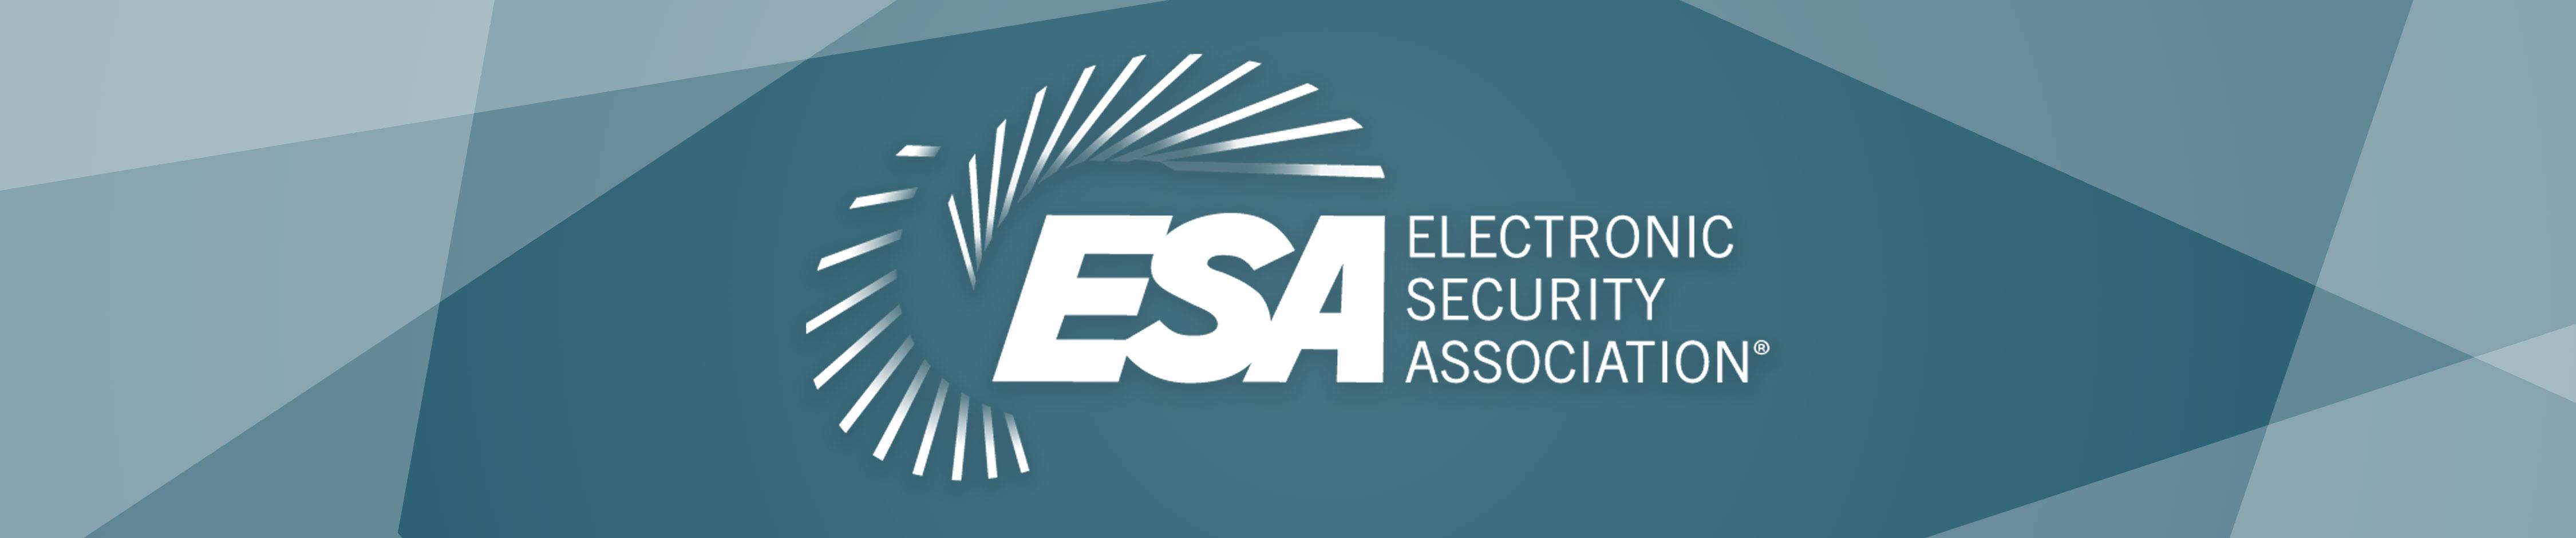 electronic-security-association